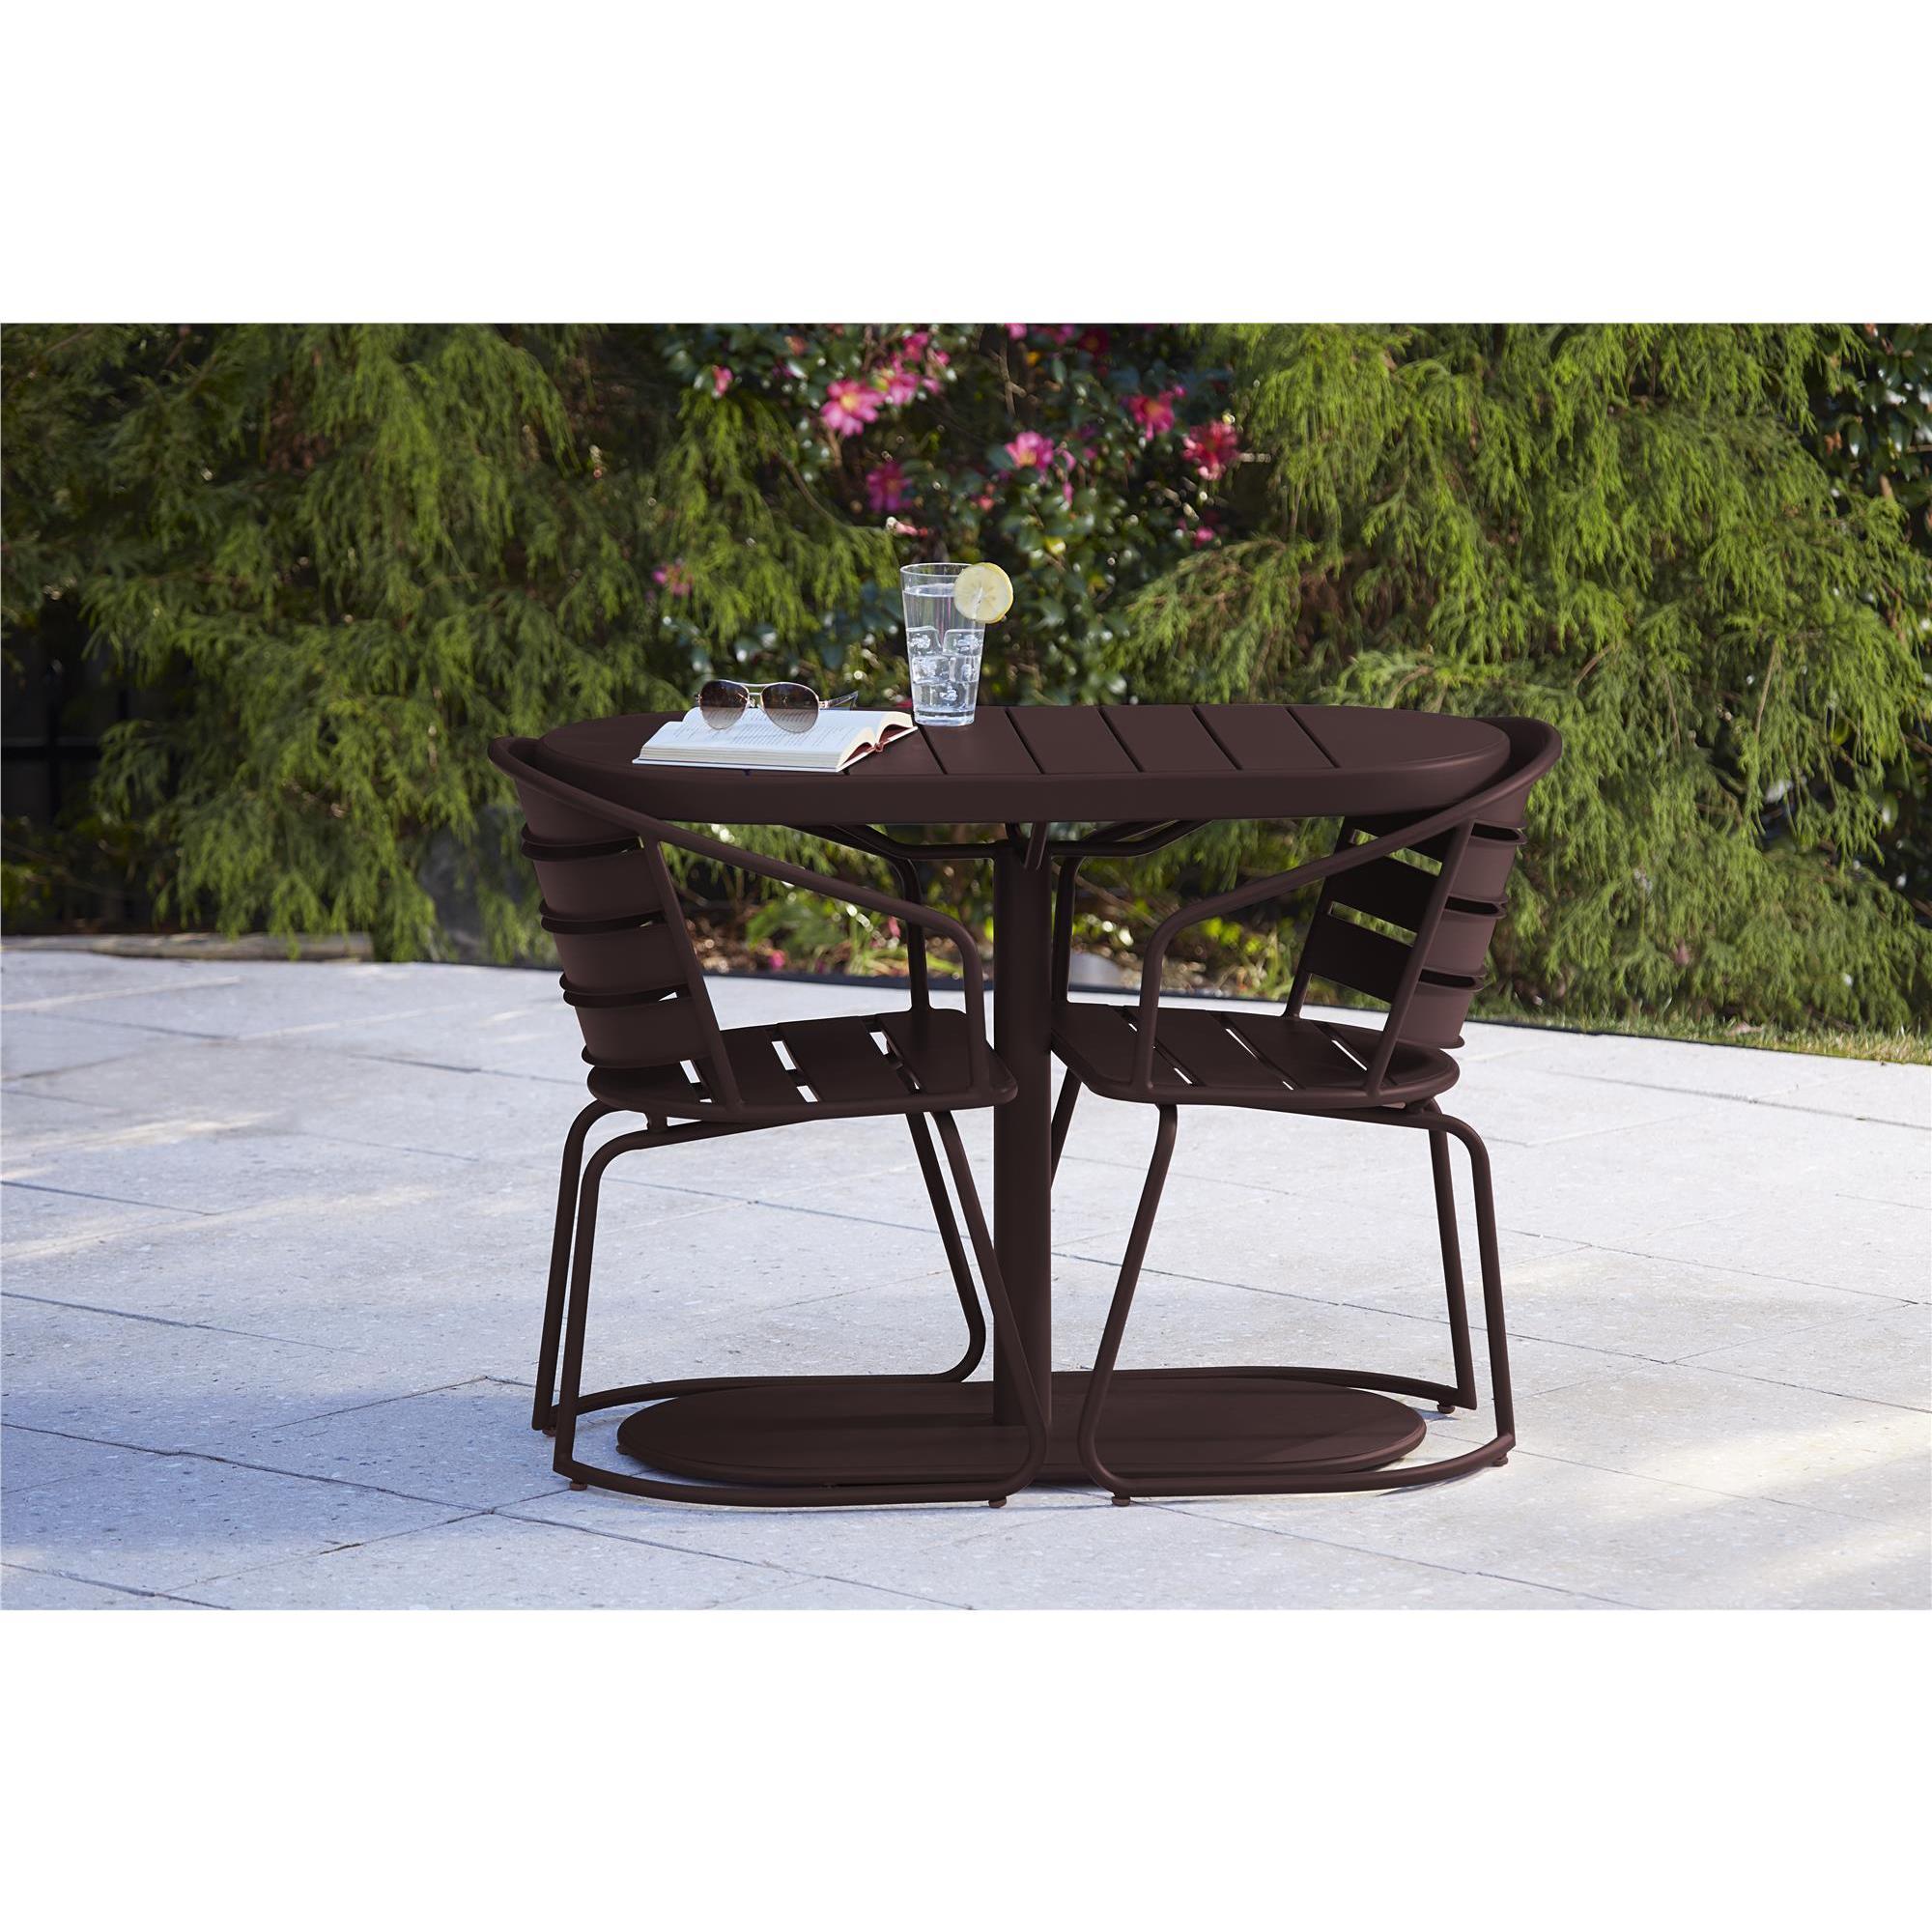 Cosco Outdoor Living 3 Piece Metro Retro Nesting Brown Bistro Steel Patio Furniture Set